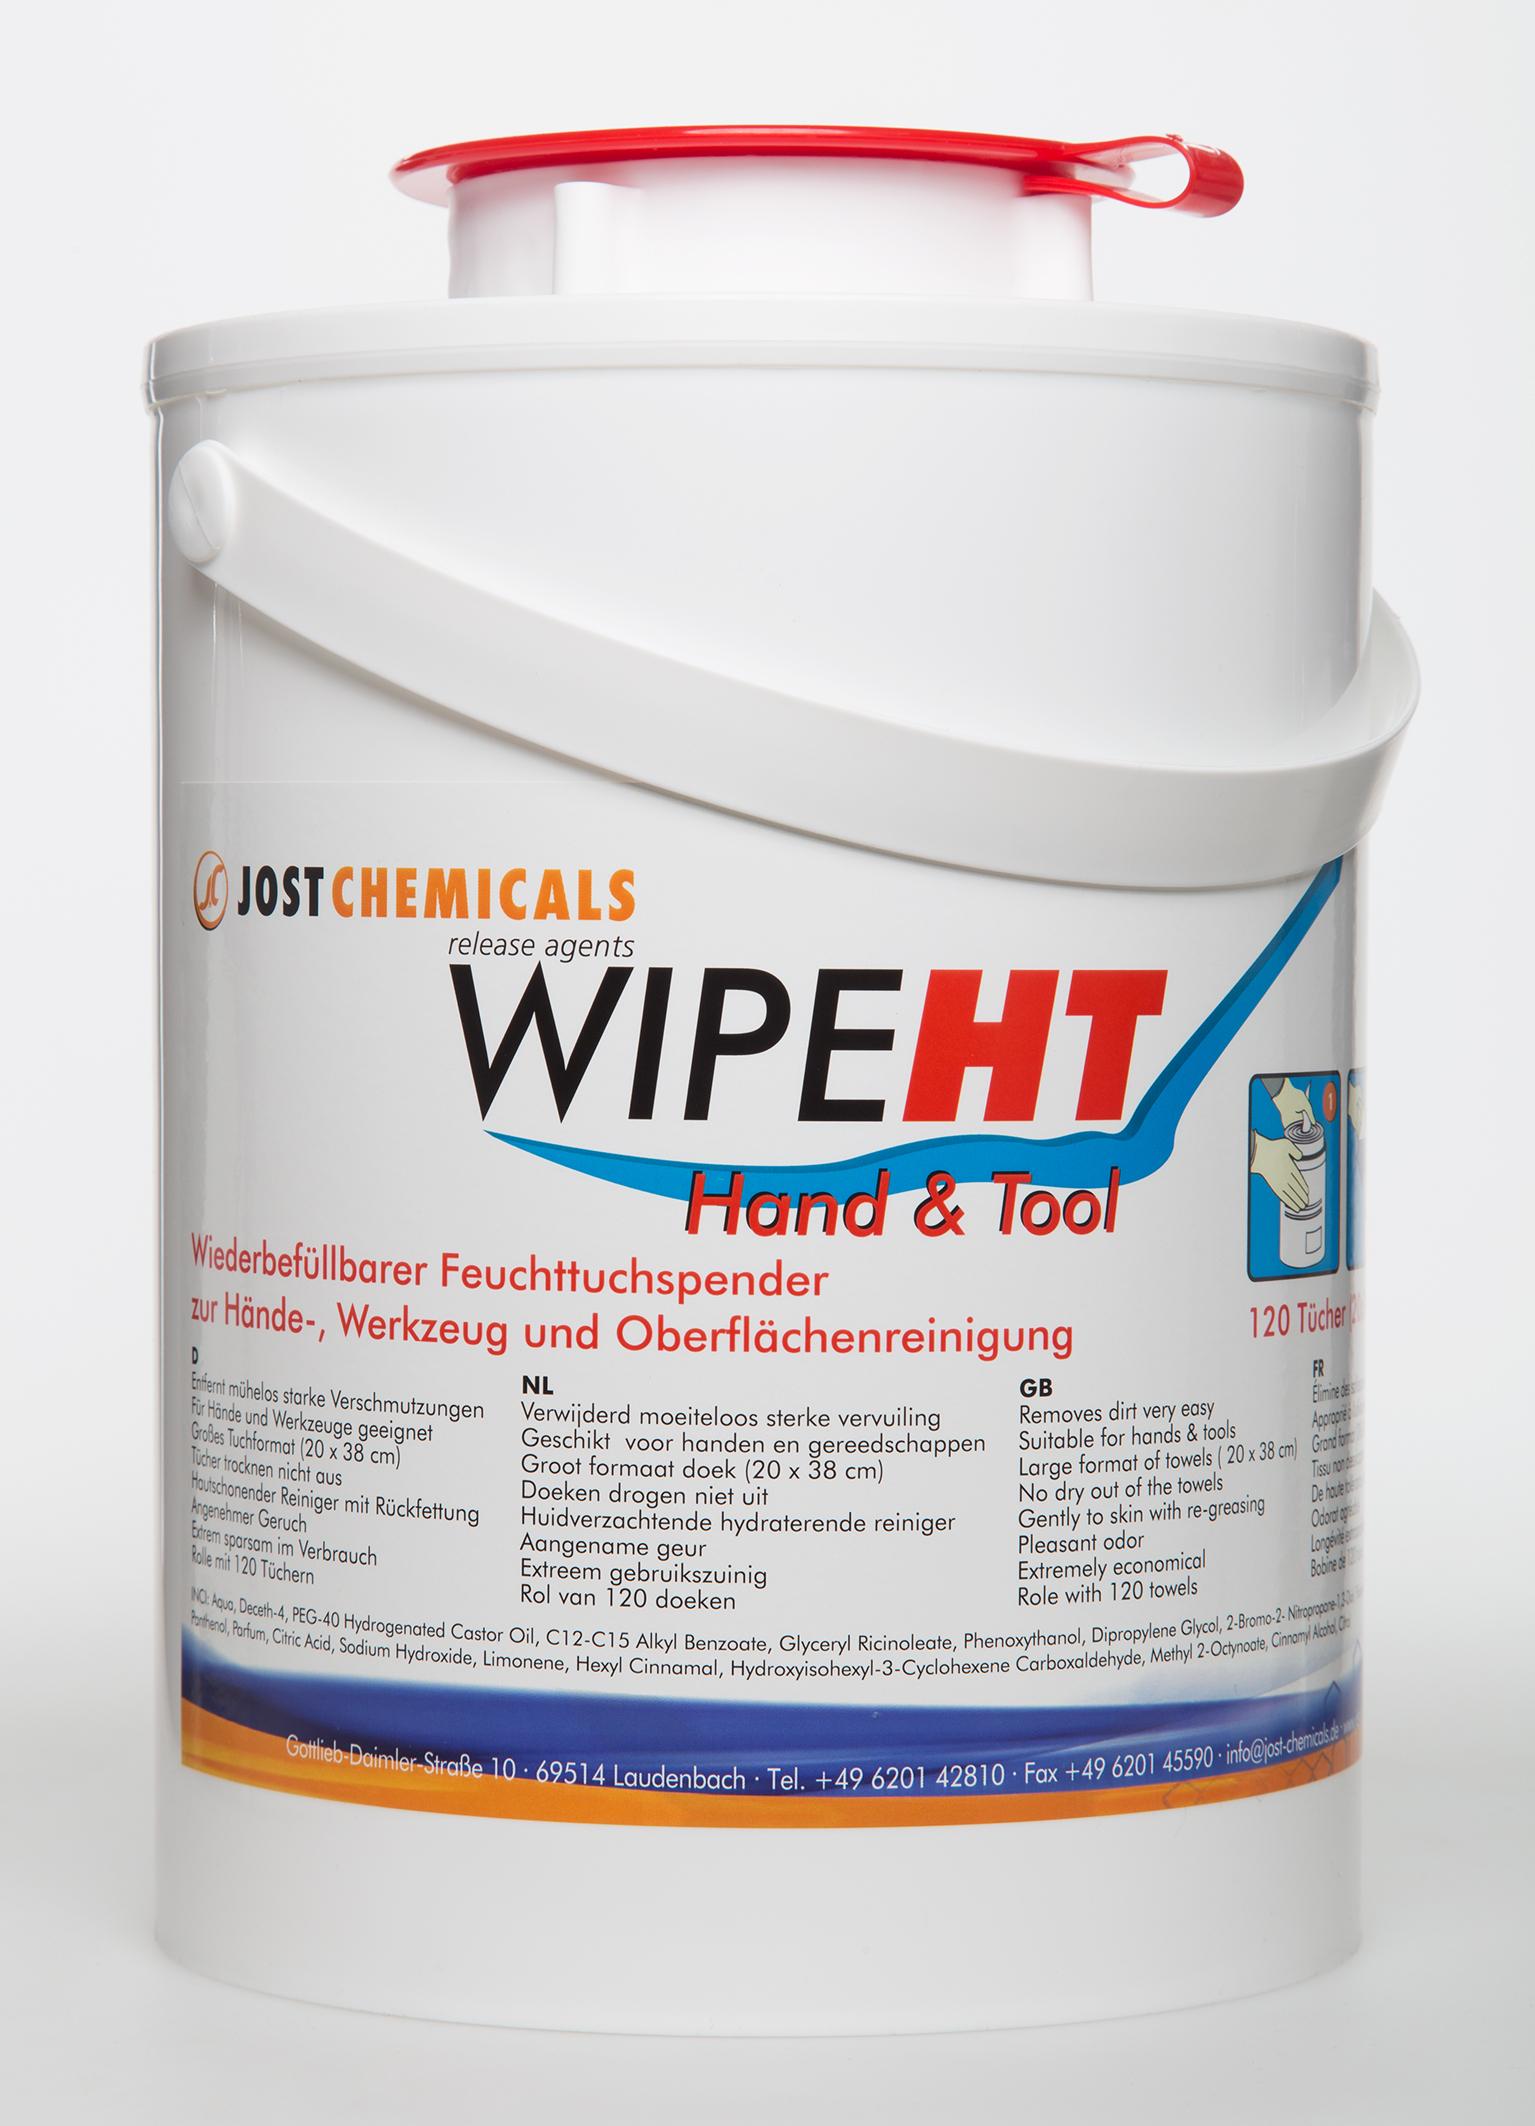 WIPE HT - Jost Chemicals GmbH